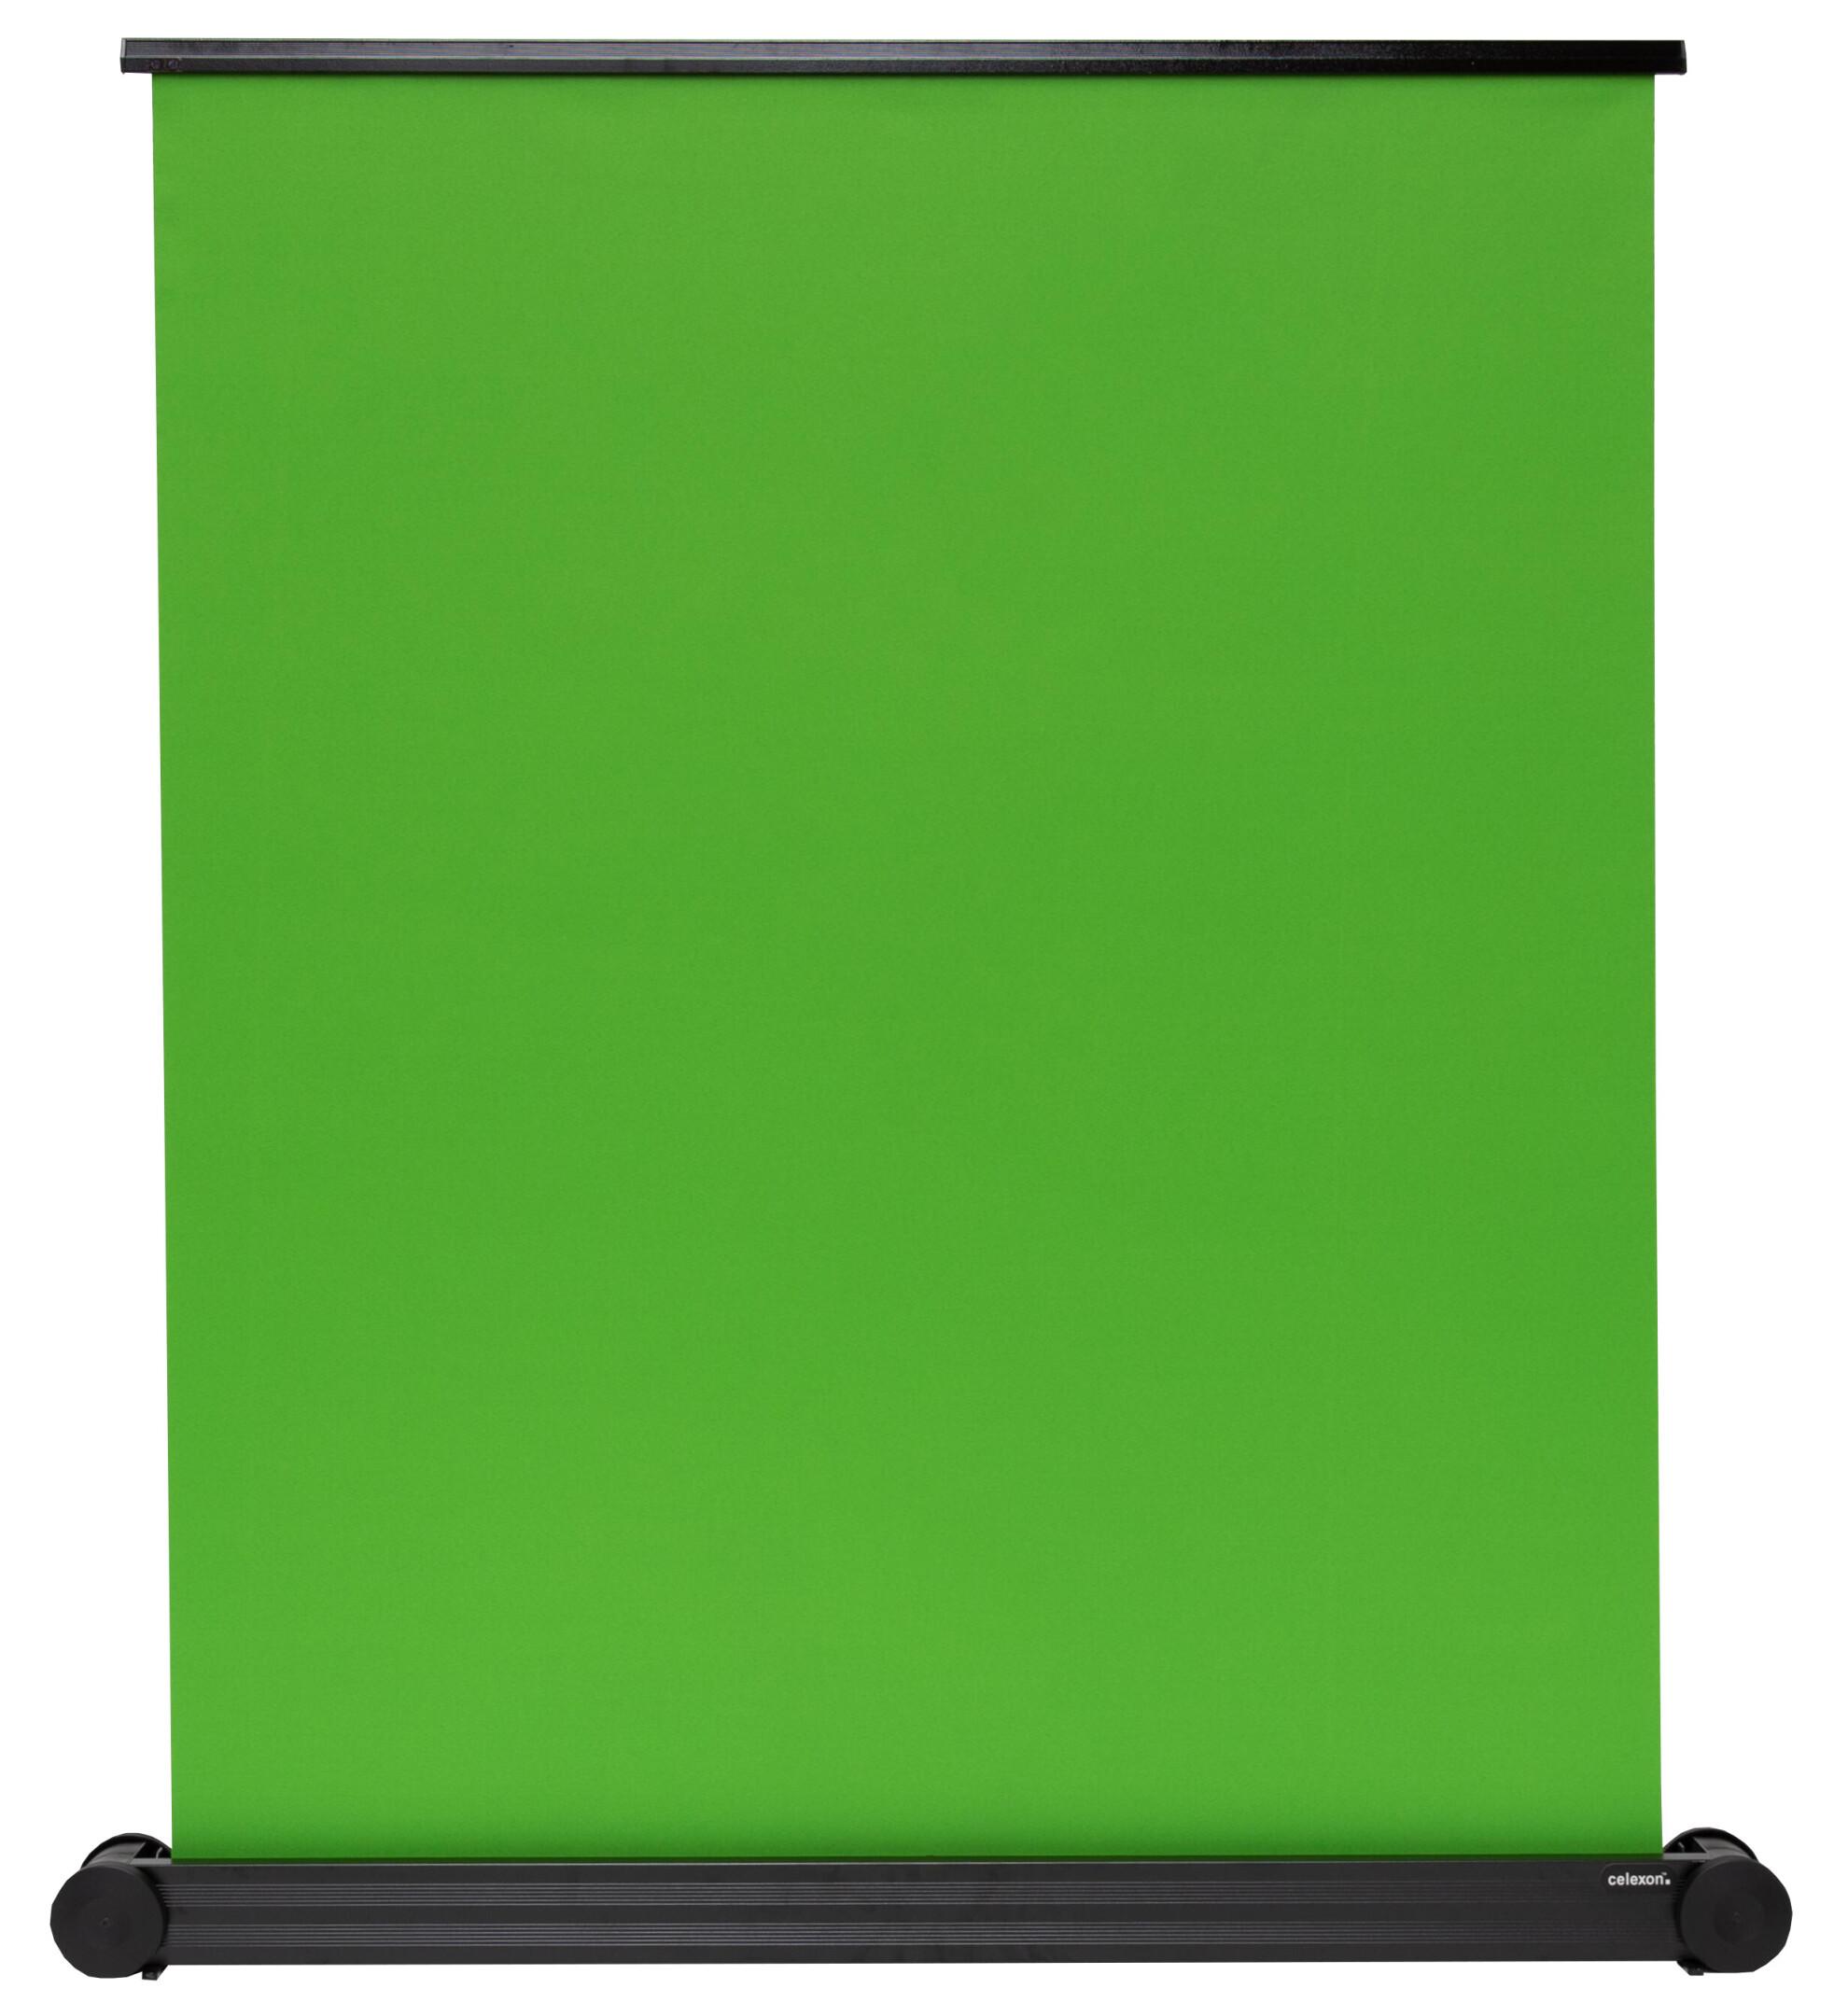 celexon Mobile Chroma Key Green Screen